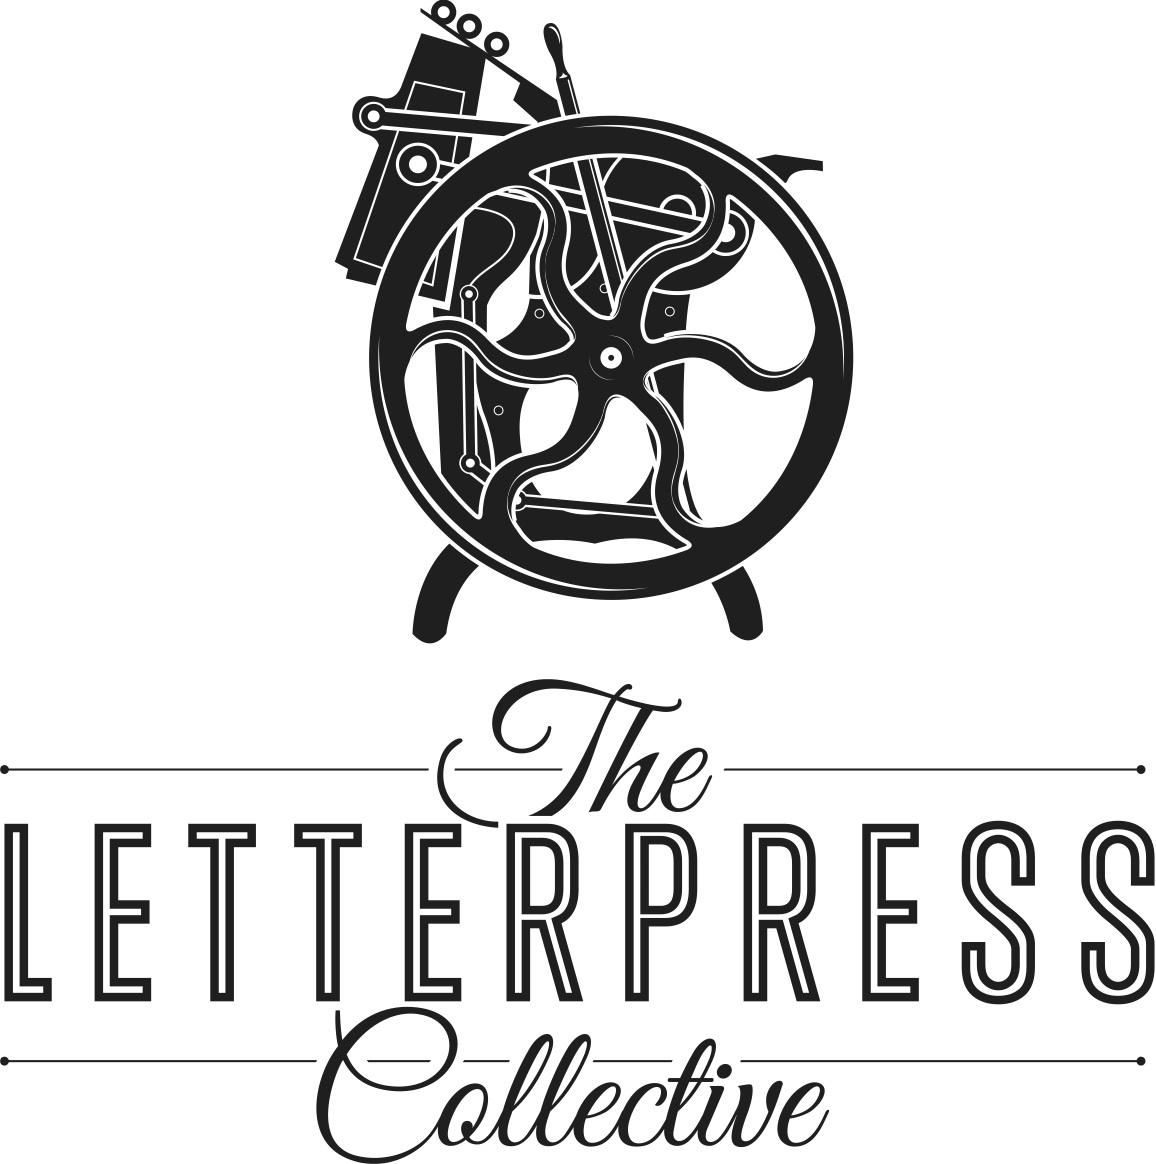 Theletterpresscollective black